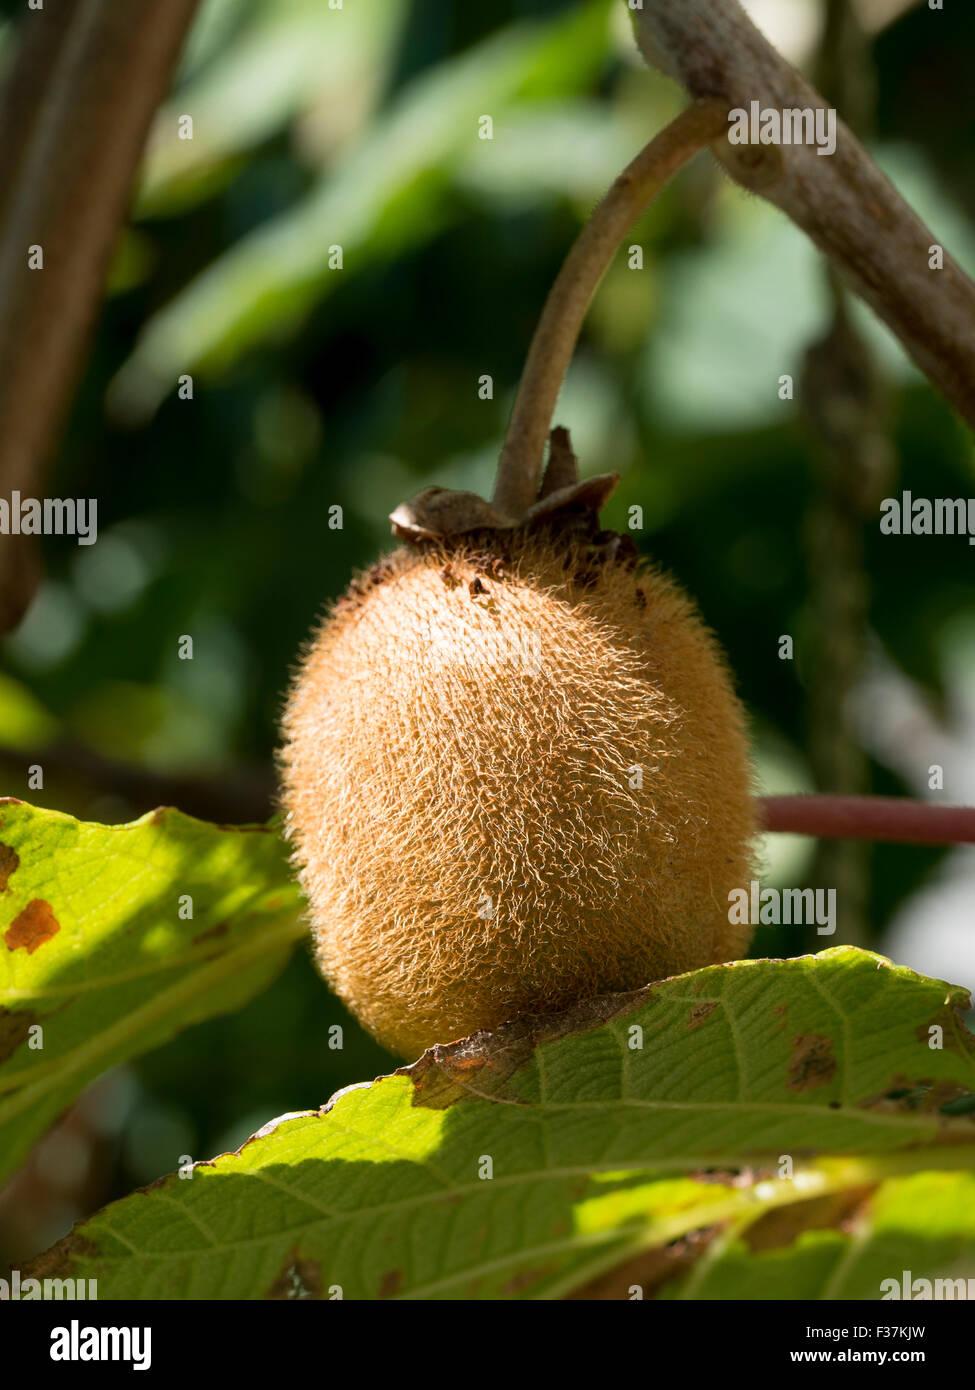 Ripe kiwi on the tree - Stock Image